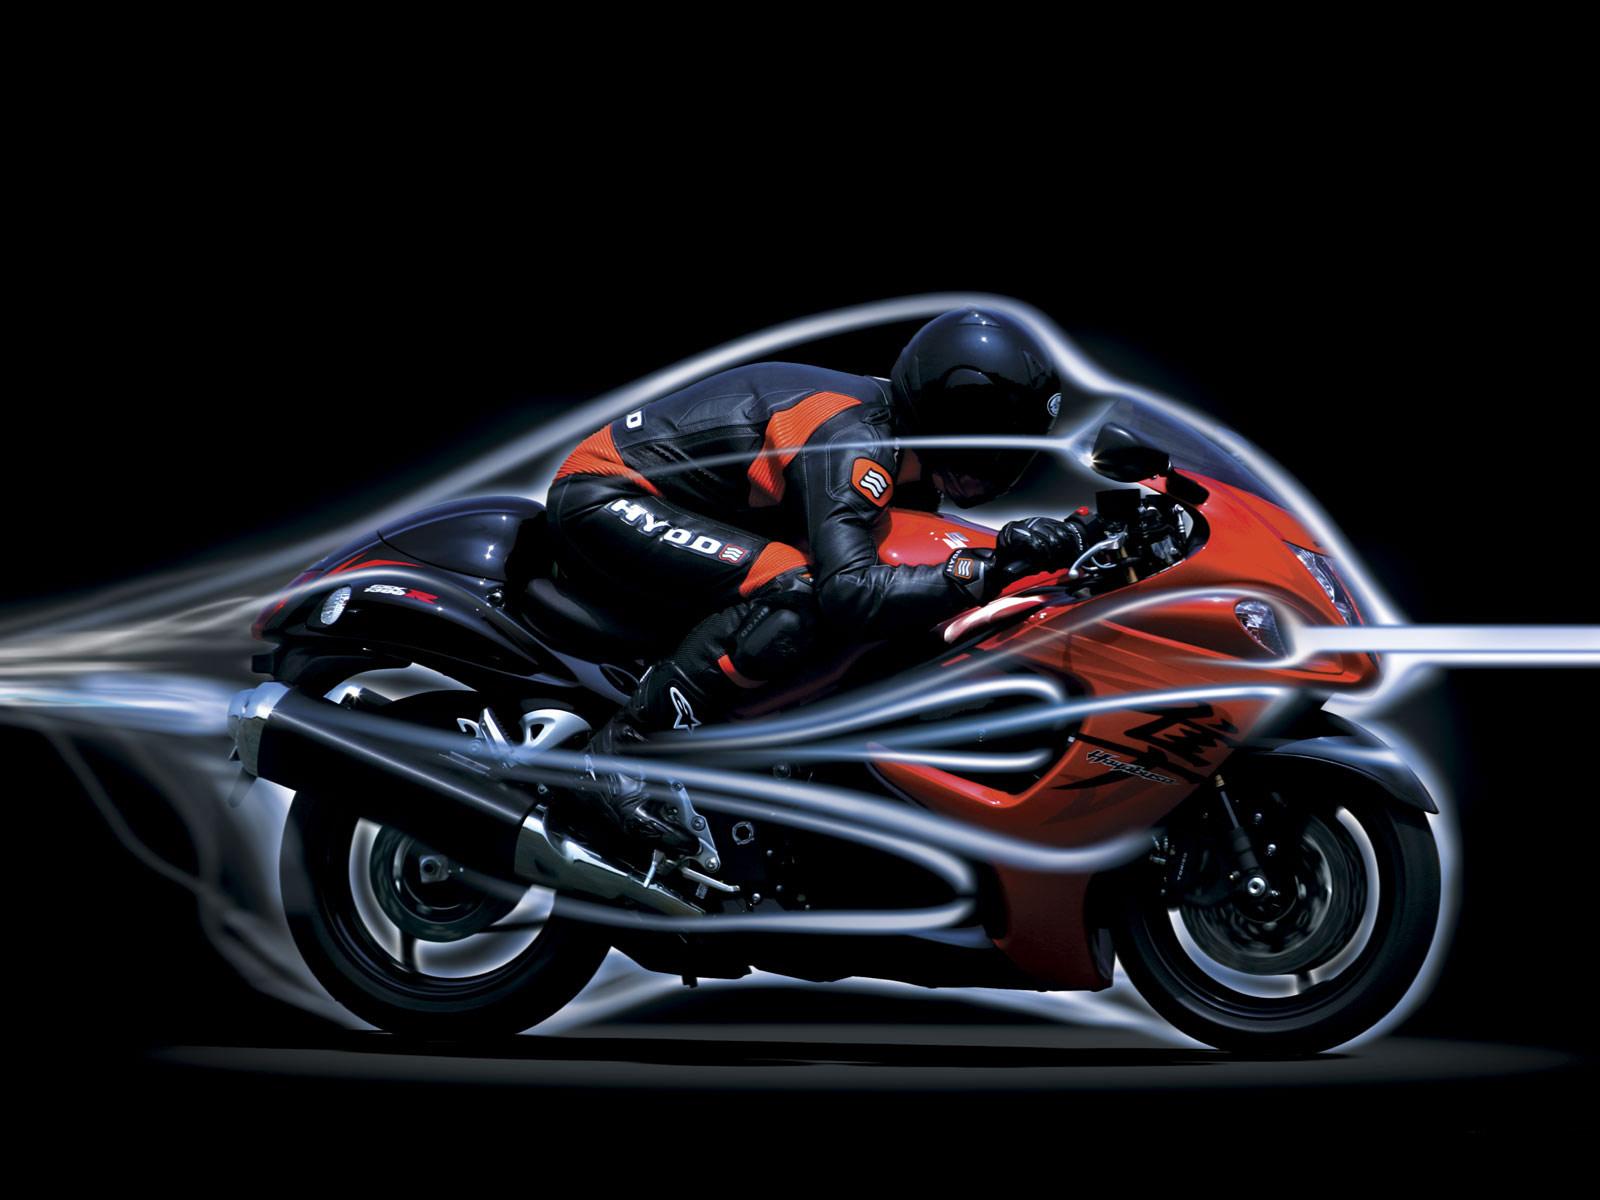 http://2.bp.blogspot.com/-ZUPDJGg9ZBA/TpzmIjGH0QI/AAAAAAAACX0/7JOOJkFUoaU/s1600/2008_suzuki_GSX1300R_Hayabusa_motorcycle-desktop-wallpaper_13.jpg